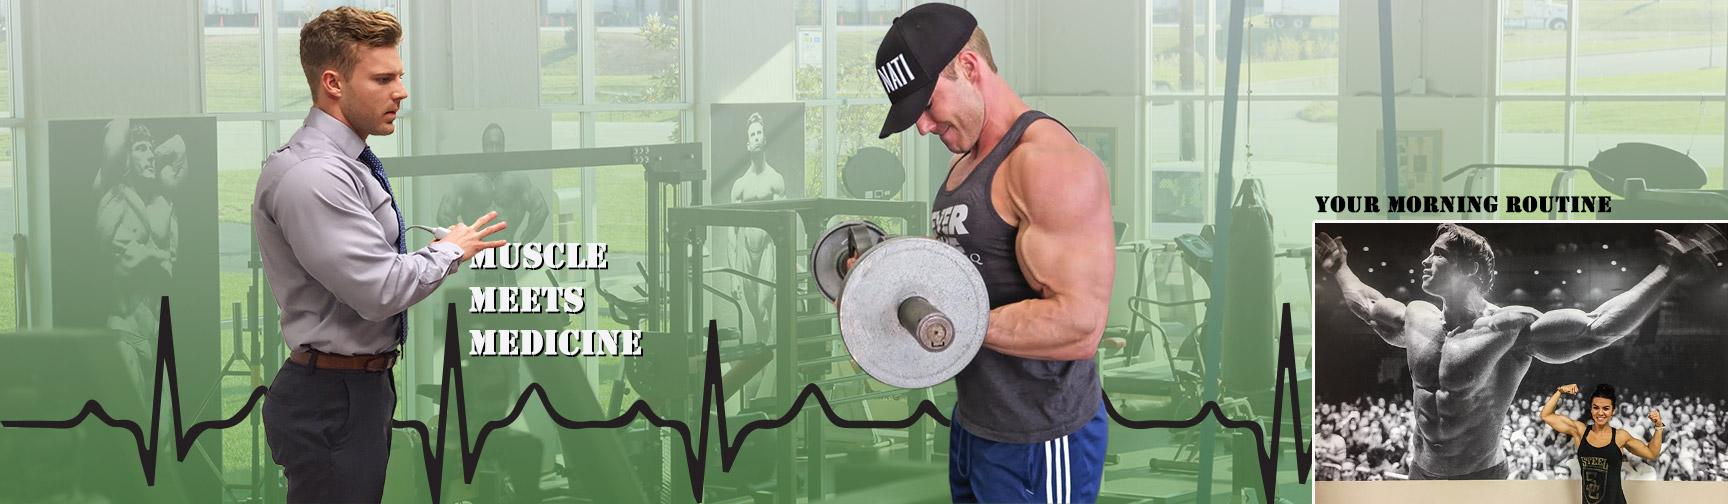 muscle-meets-medicine-banner